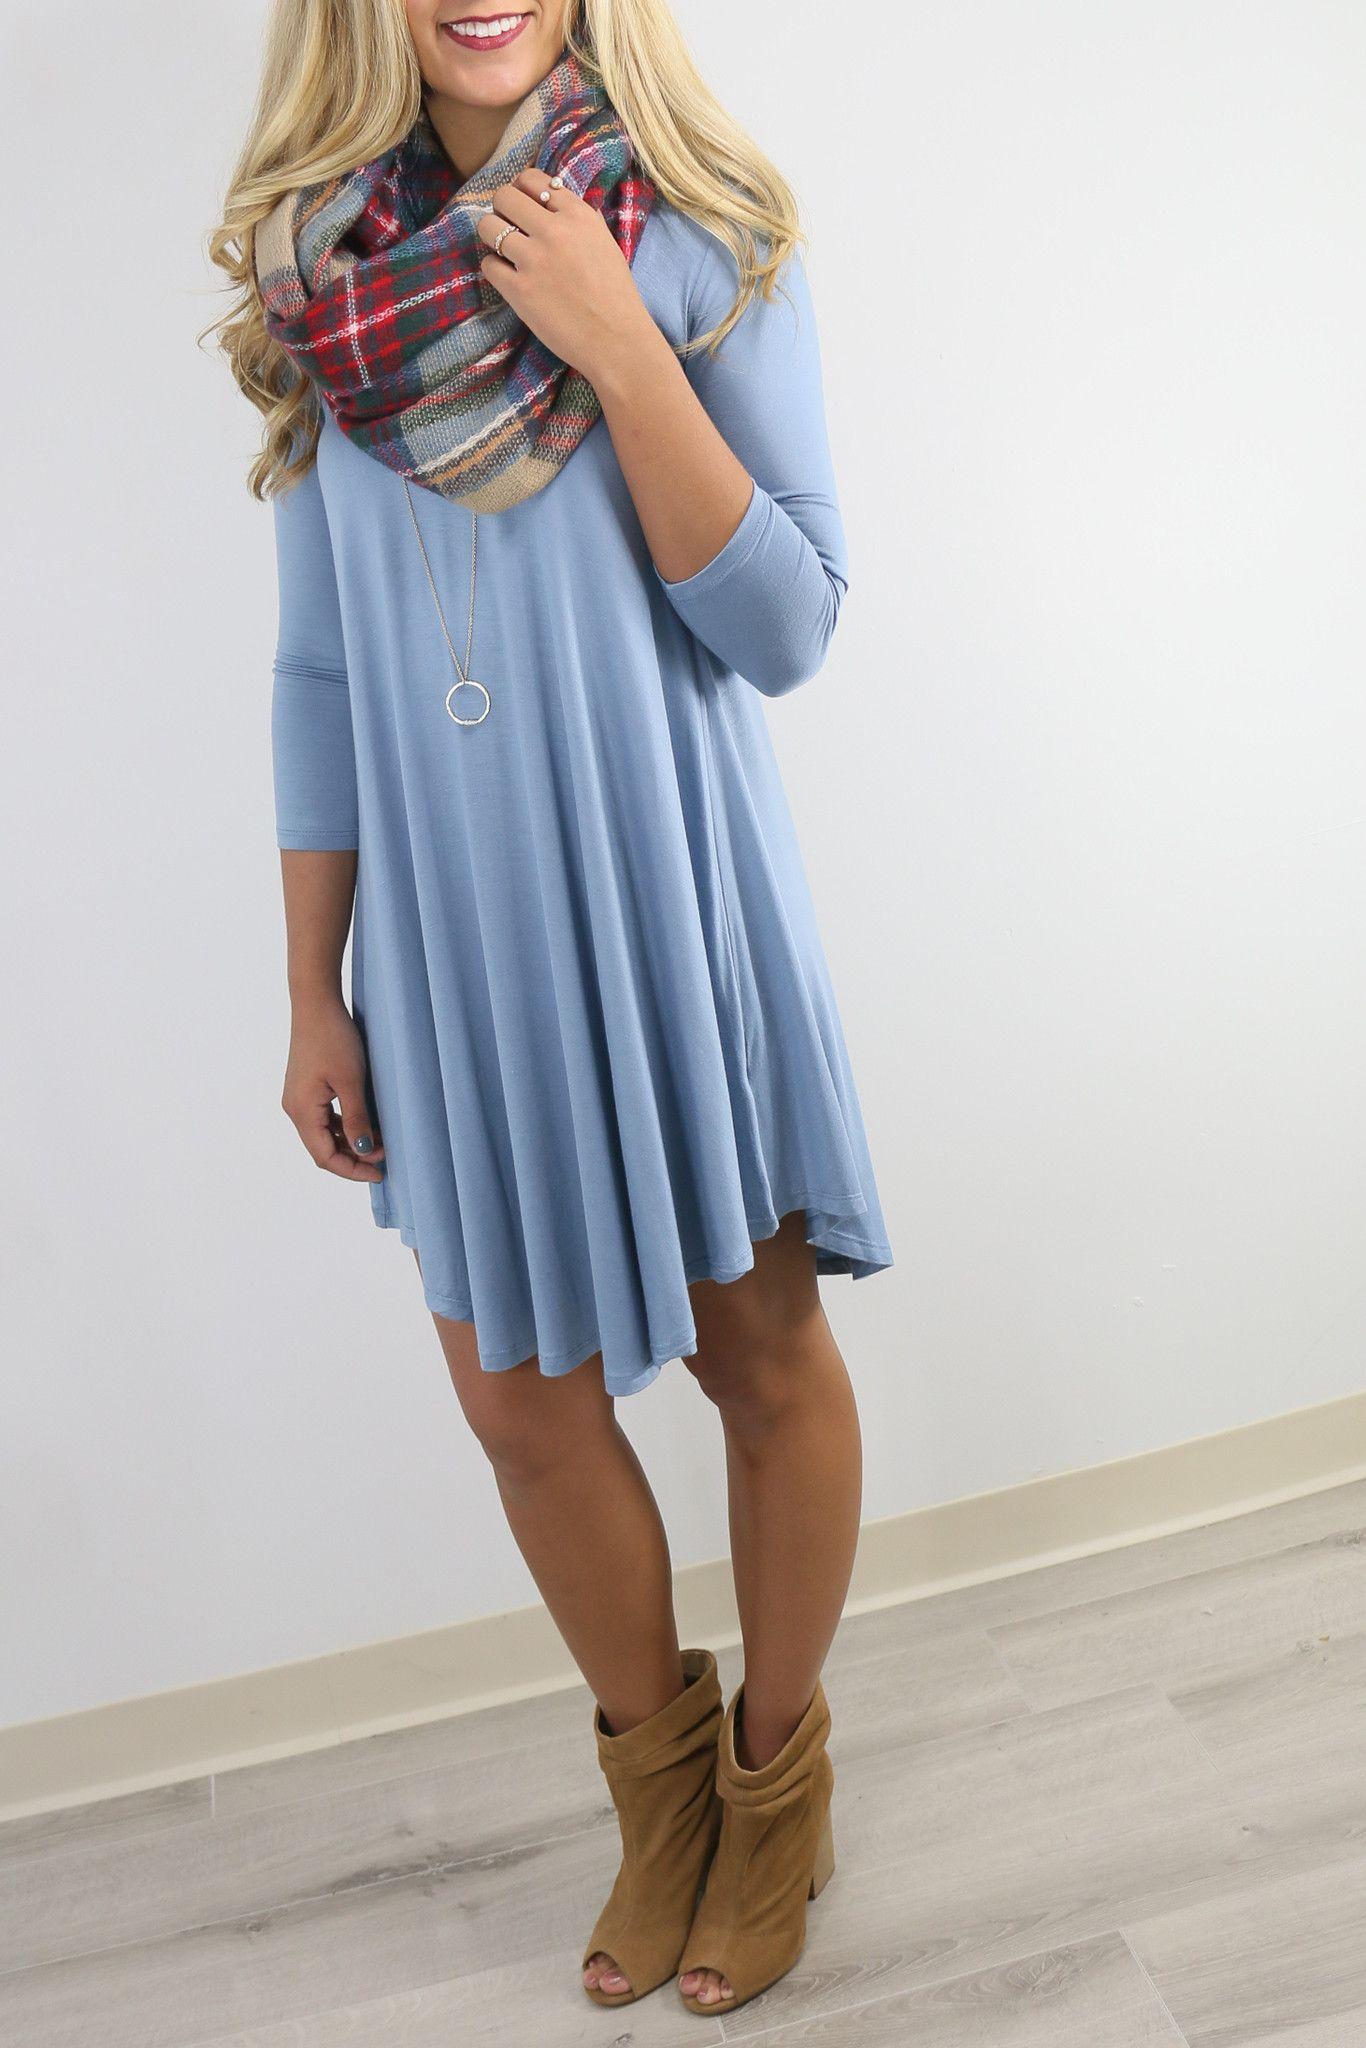 Never Let Go Slate Blue V-Neck Quarter Sleeve Dress | Quarter sleeve ...